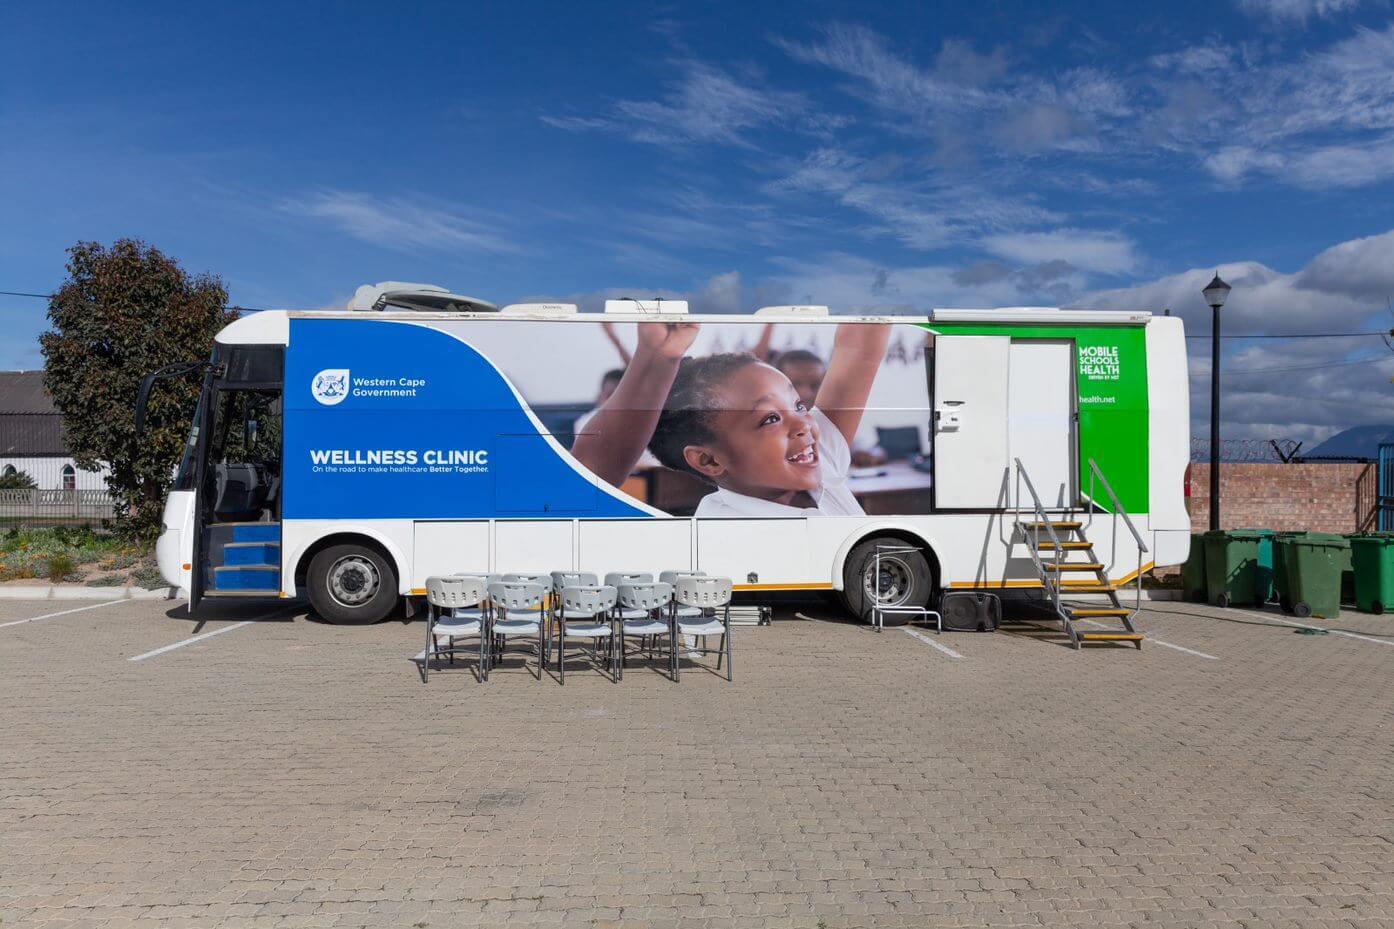 Mobile Schools Health mobile unit